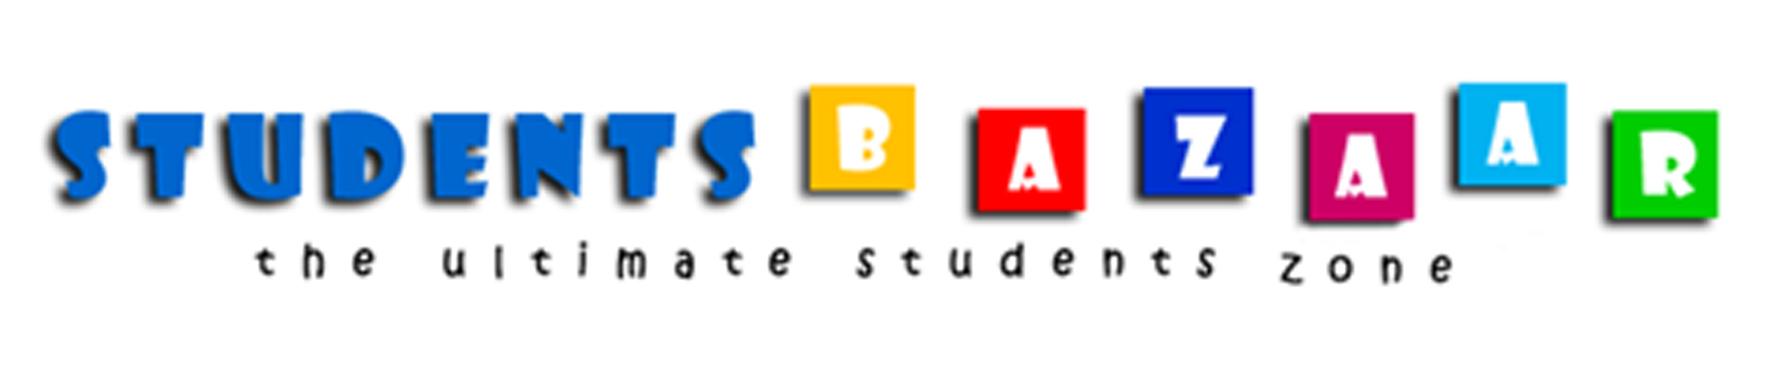 StudentsBazaar-logo